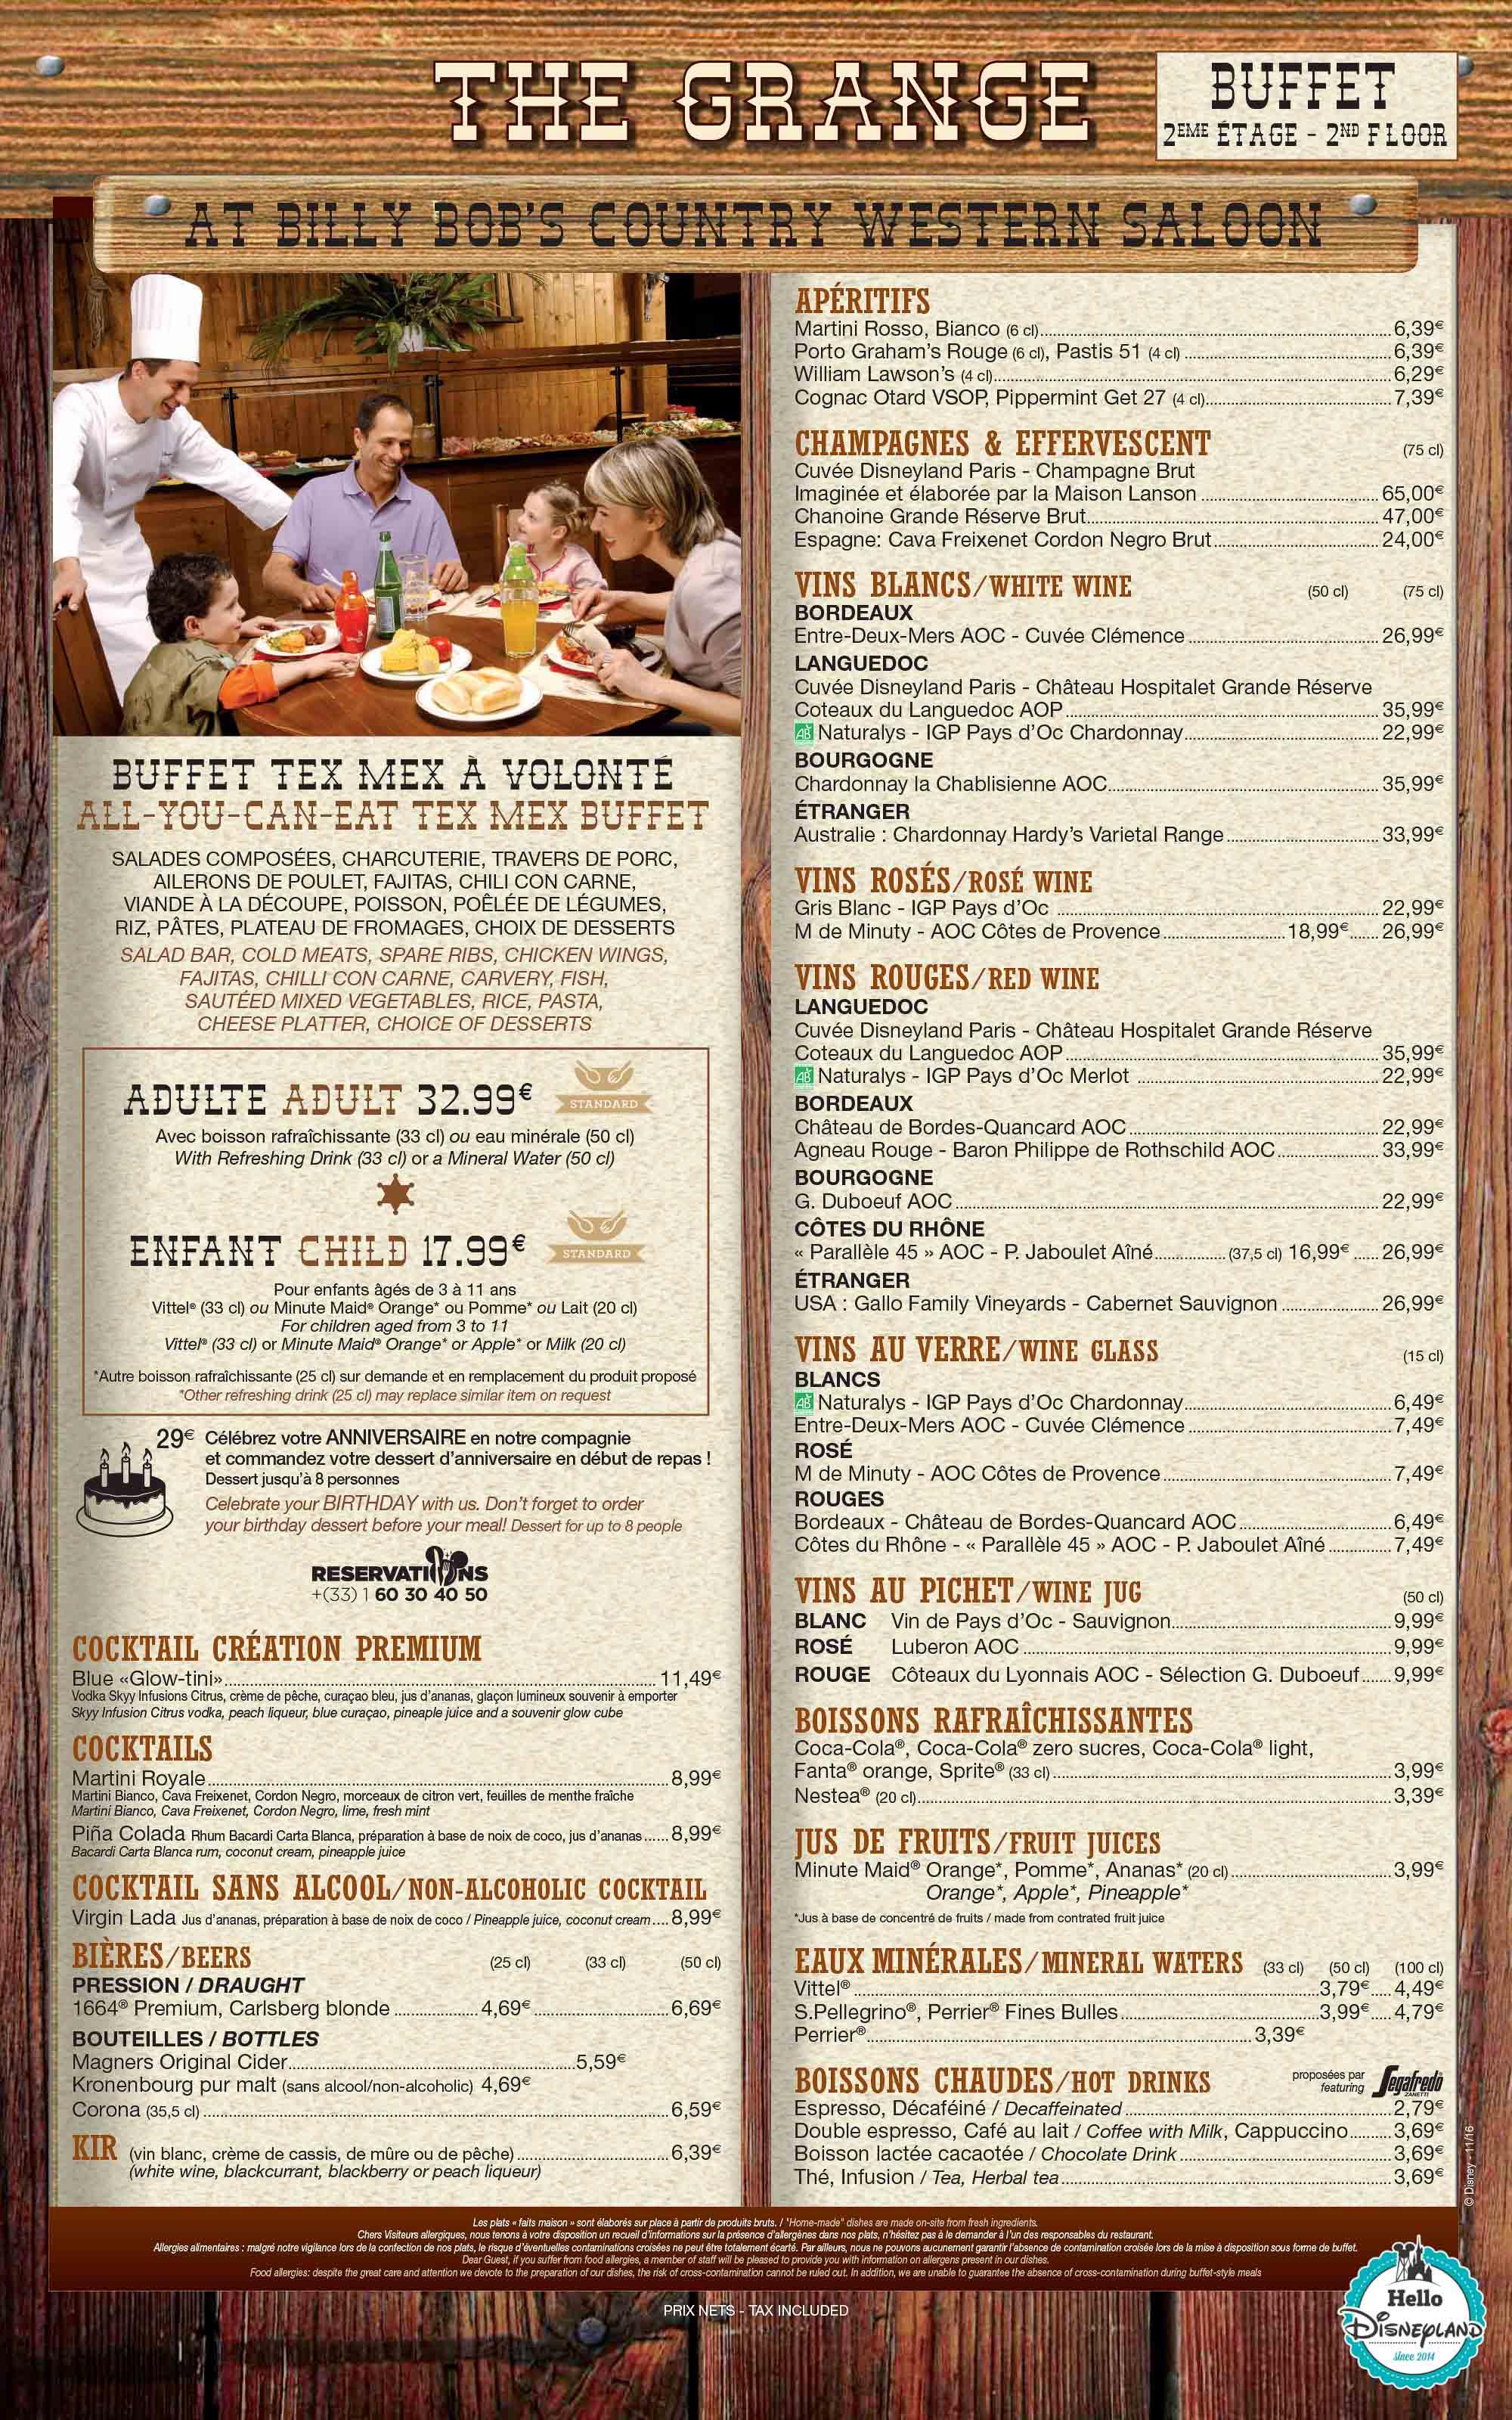 La grange  - Menu Restaurant 2015 - 2016 Disneyland Paris